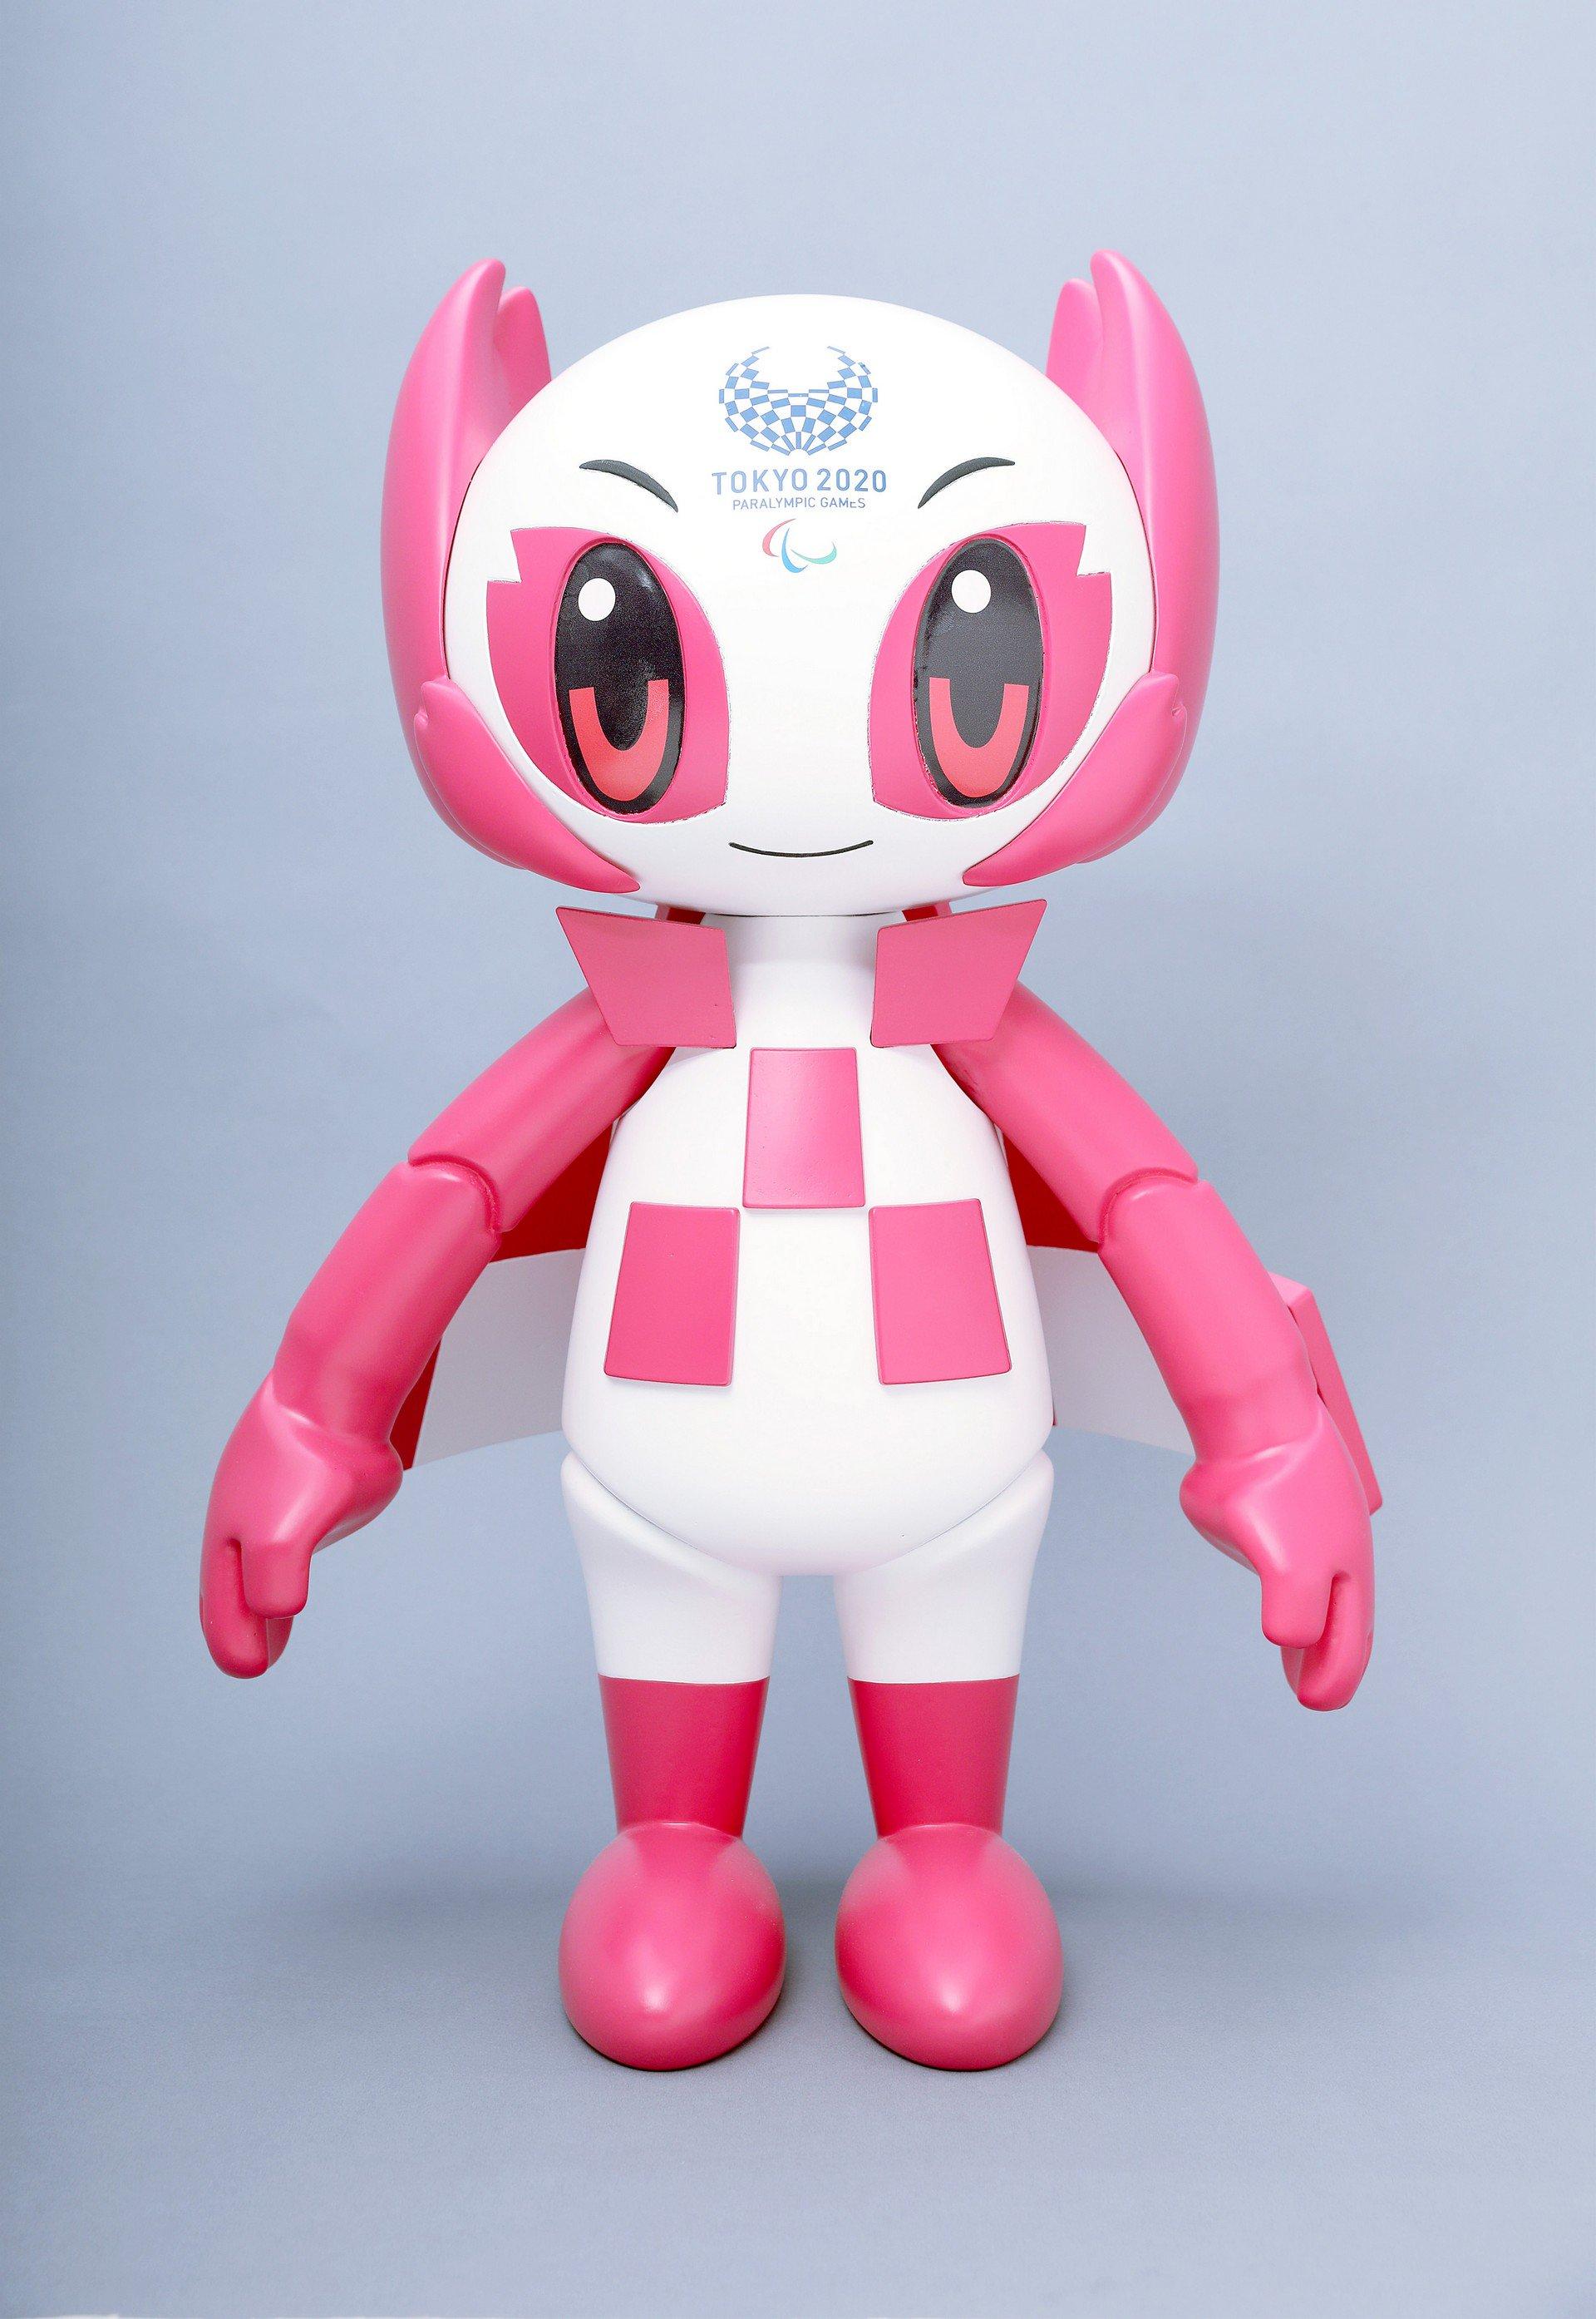 761464e2-toyota-robots-for-2020-olympics-5